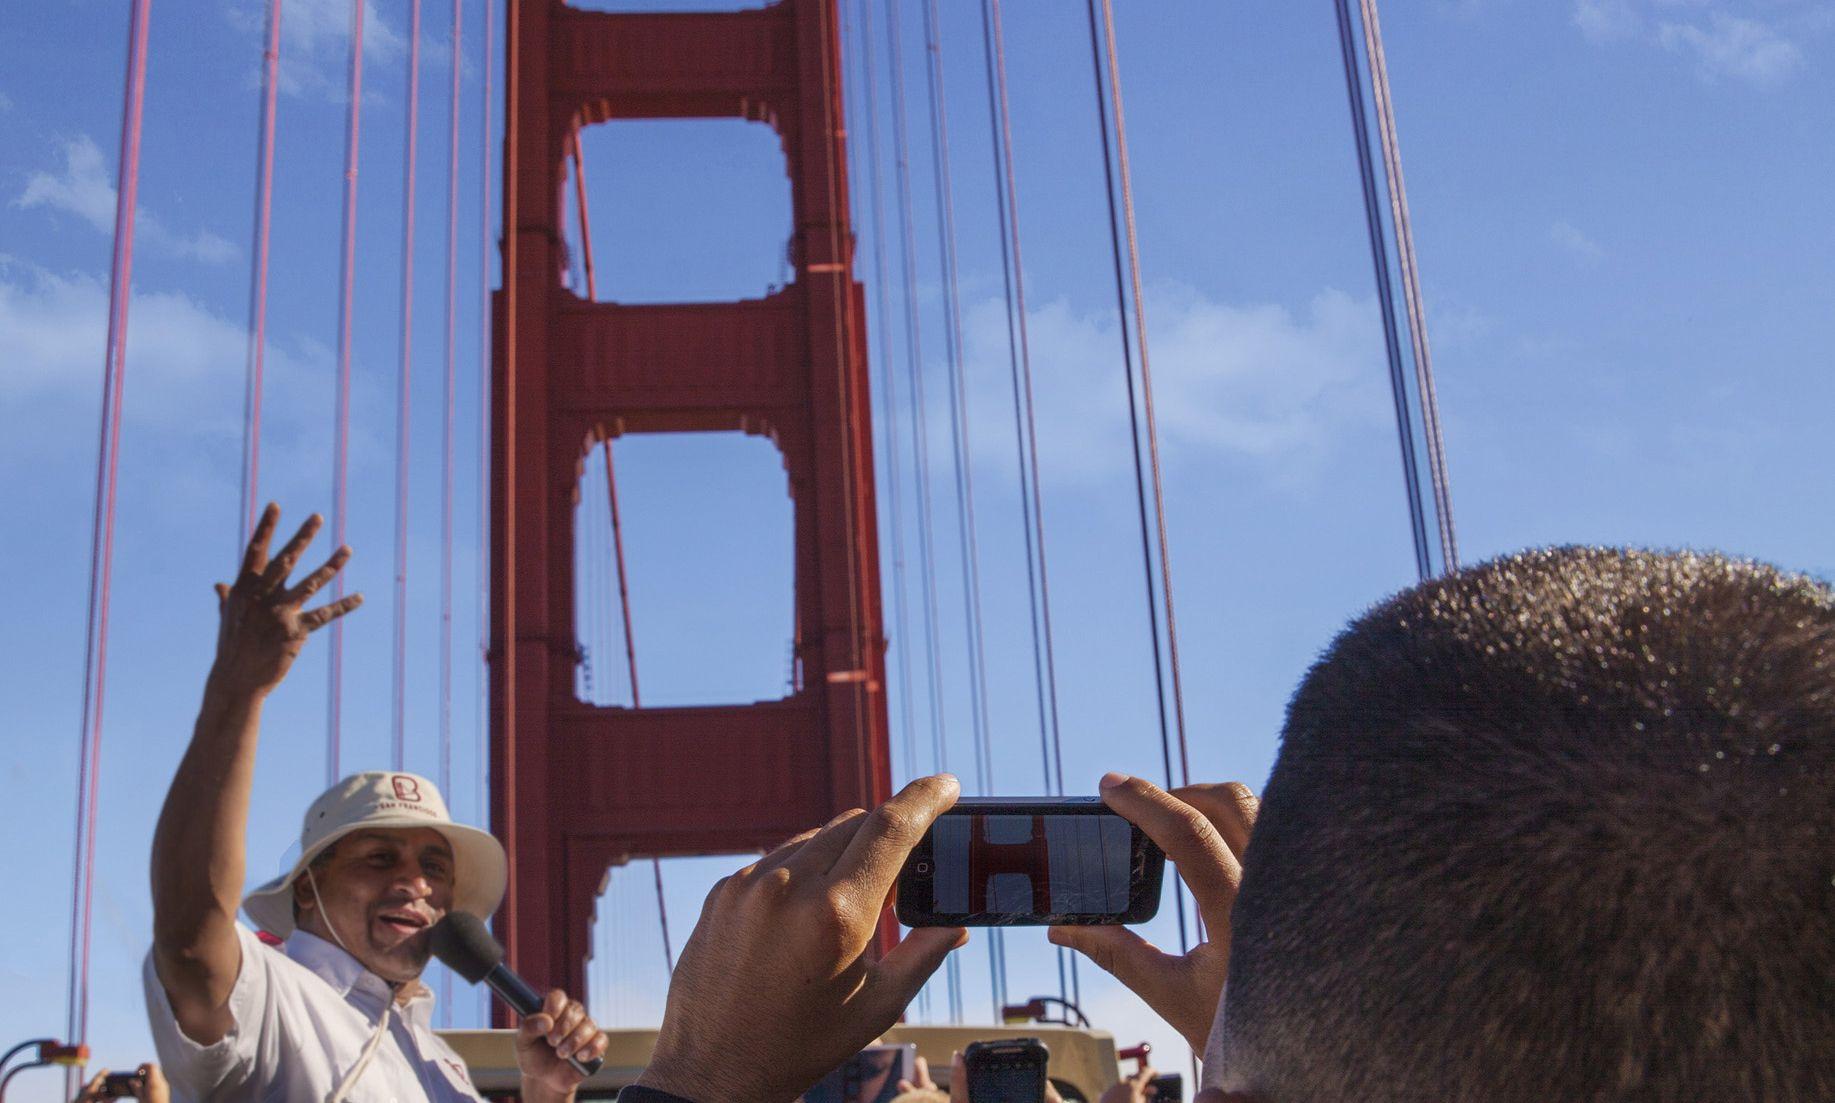 Bus the Golden Gate Bridge